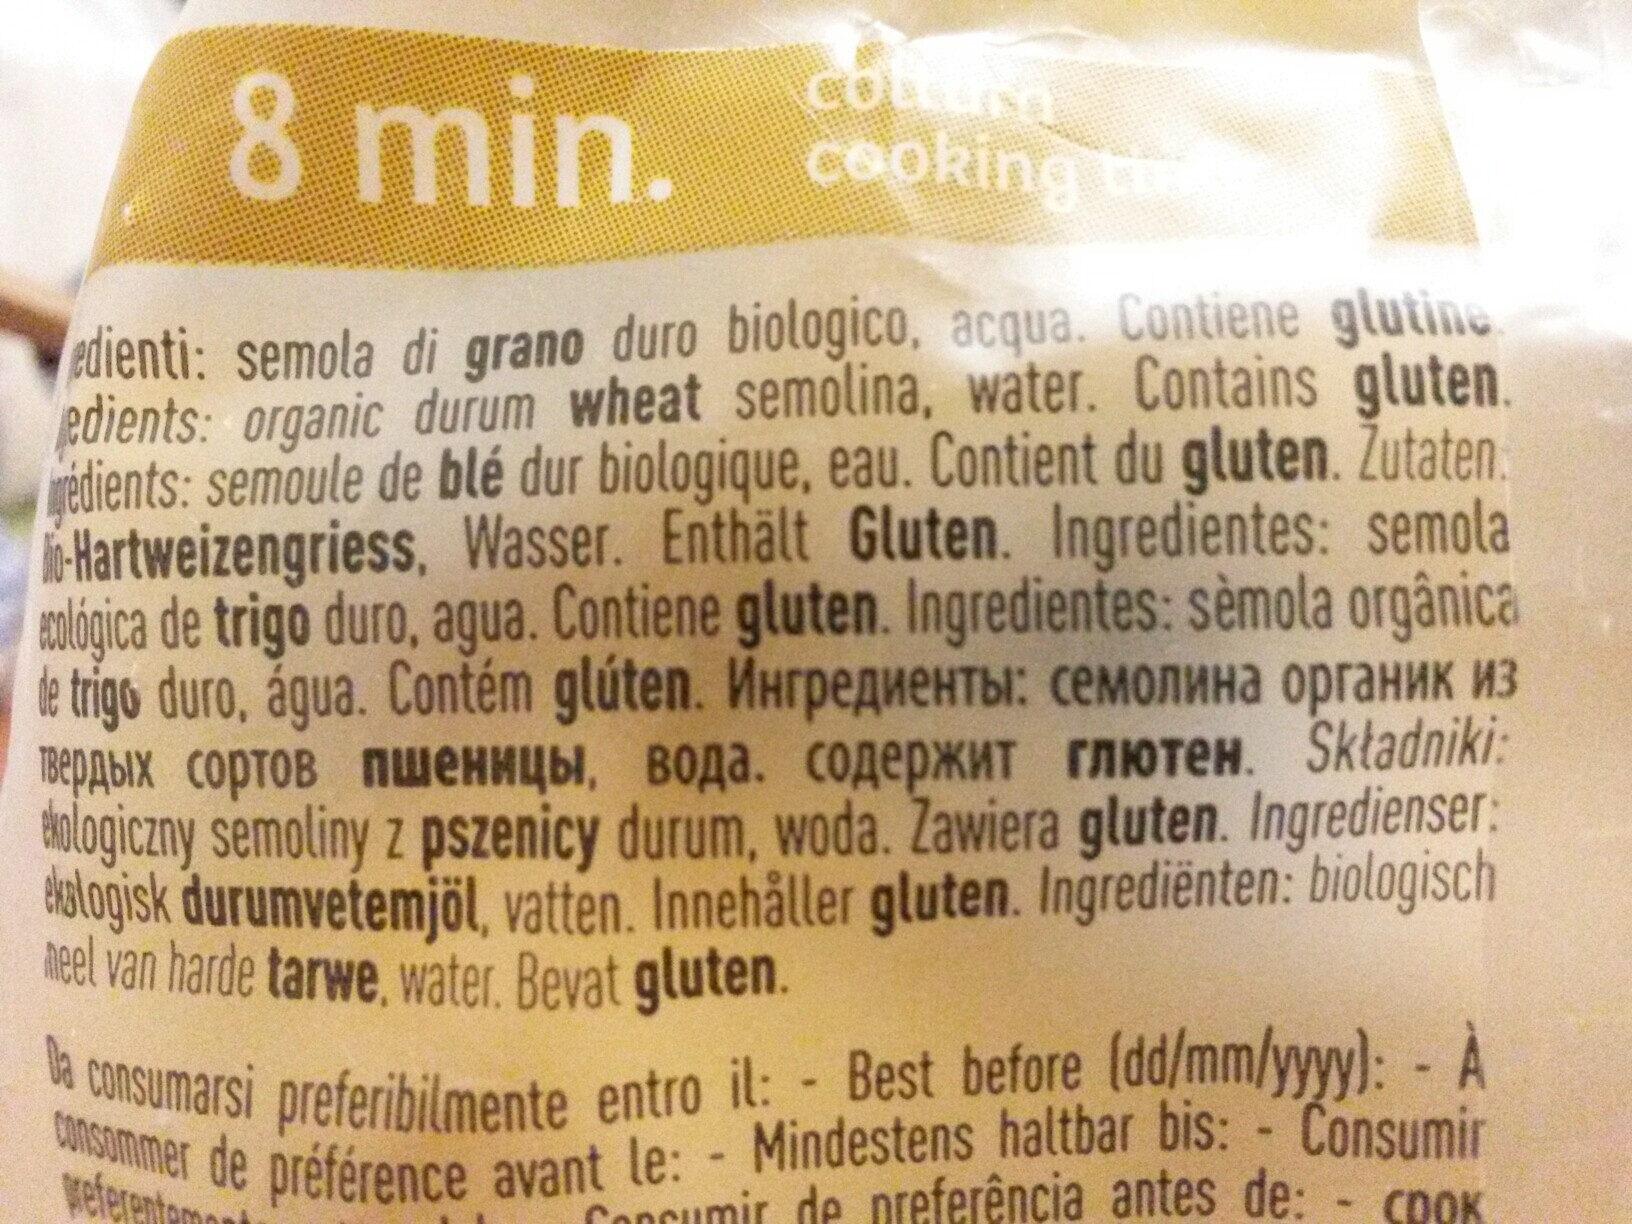 Tagliatelle grano duro - Ingrédients - fr